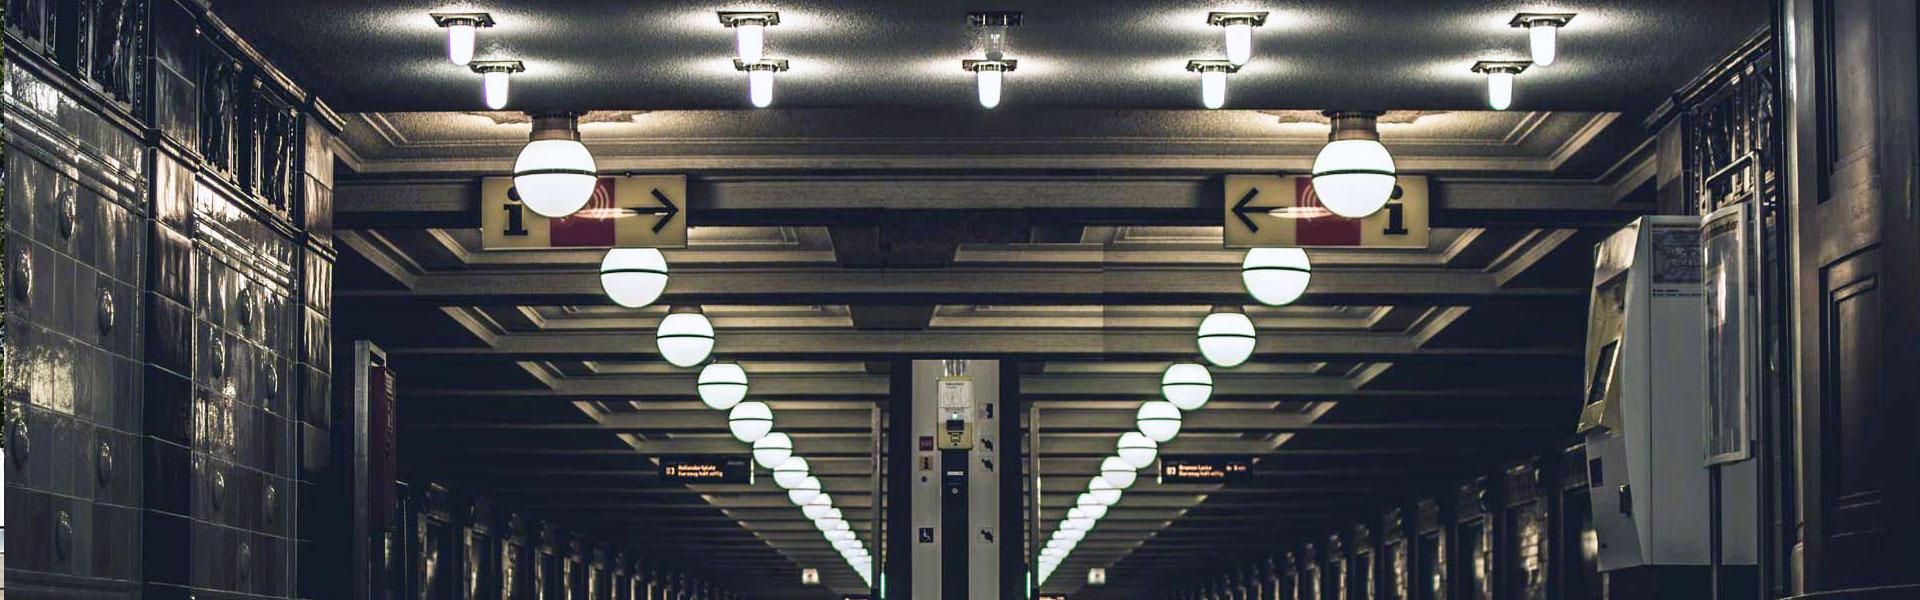 Lighting in Commercial Building